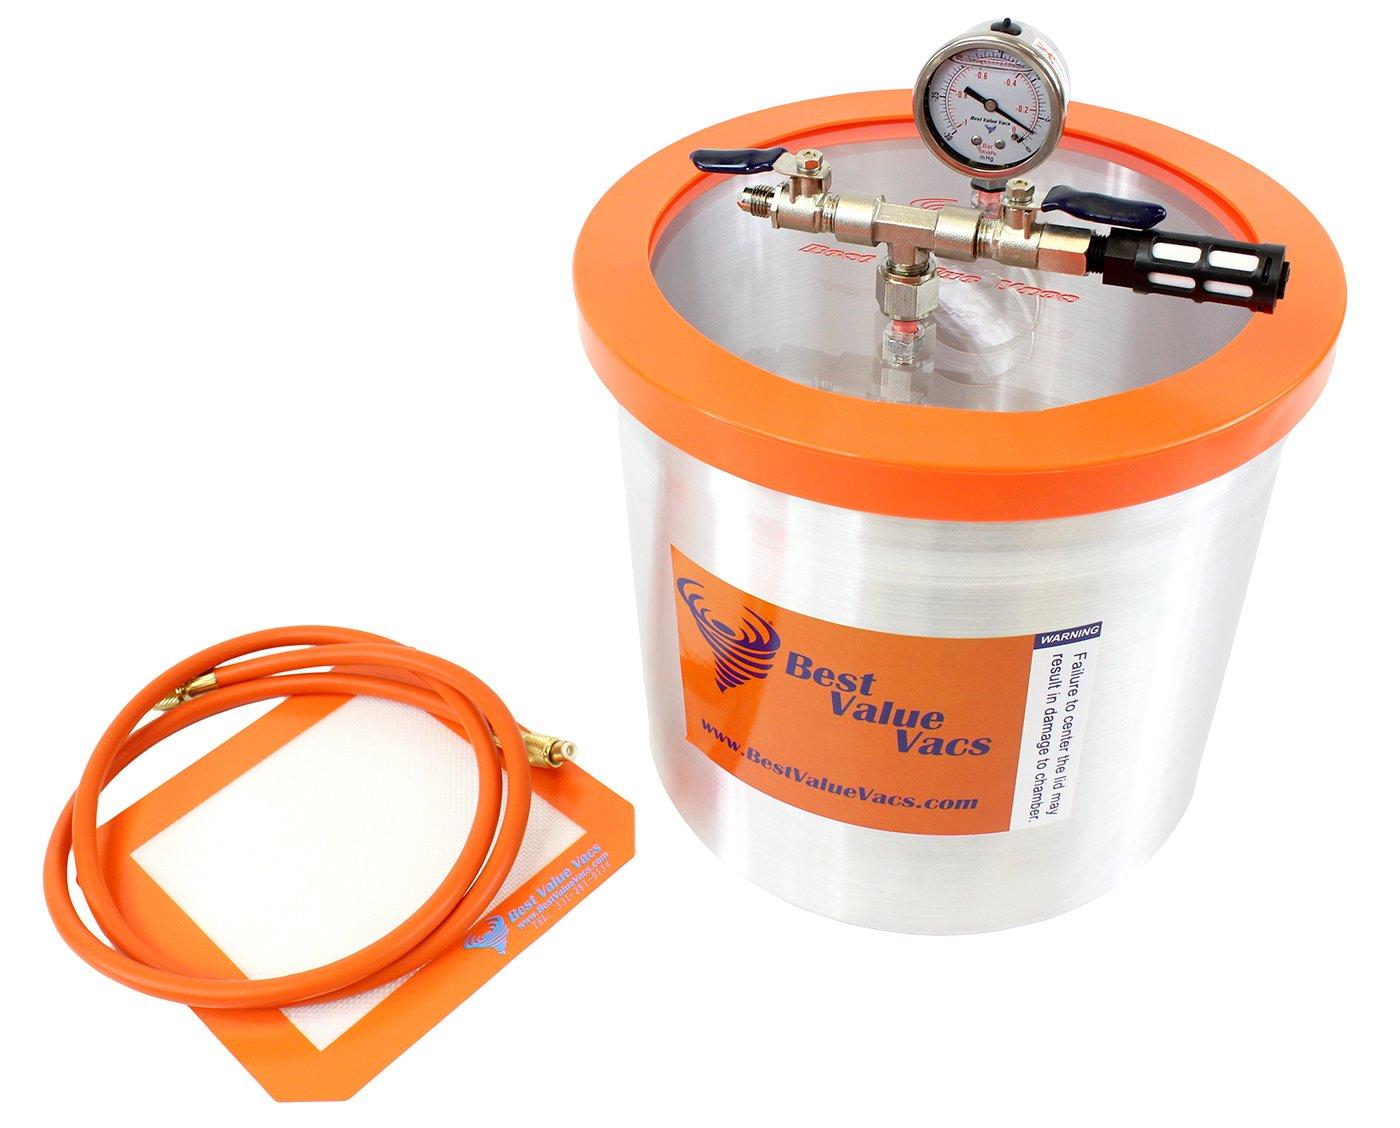 Best Value Vacs 3 Gallon Aluminum Vacuum Degassing Chamber- Purge, Degas, Silicone, Resin, Epoxy